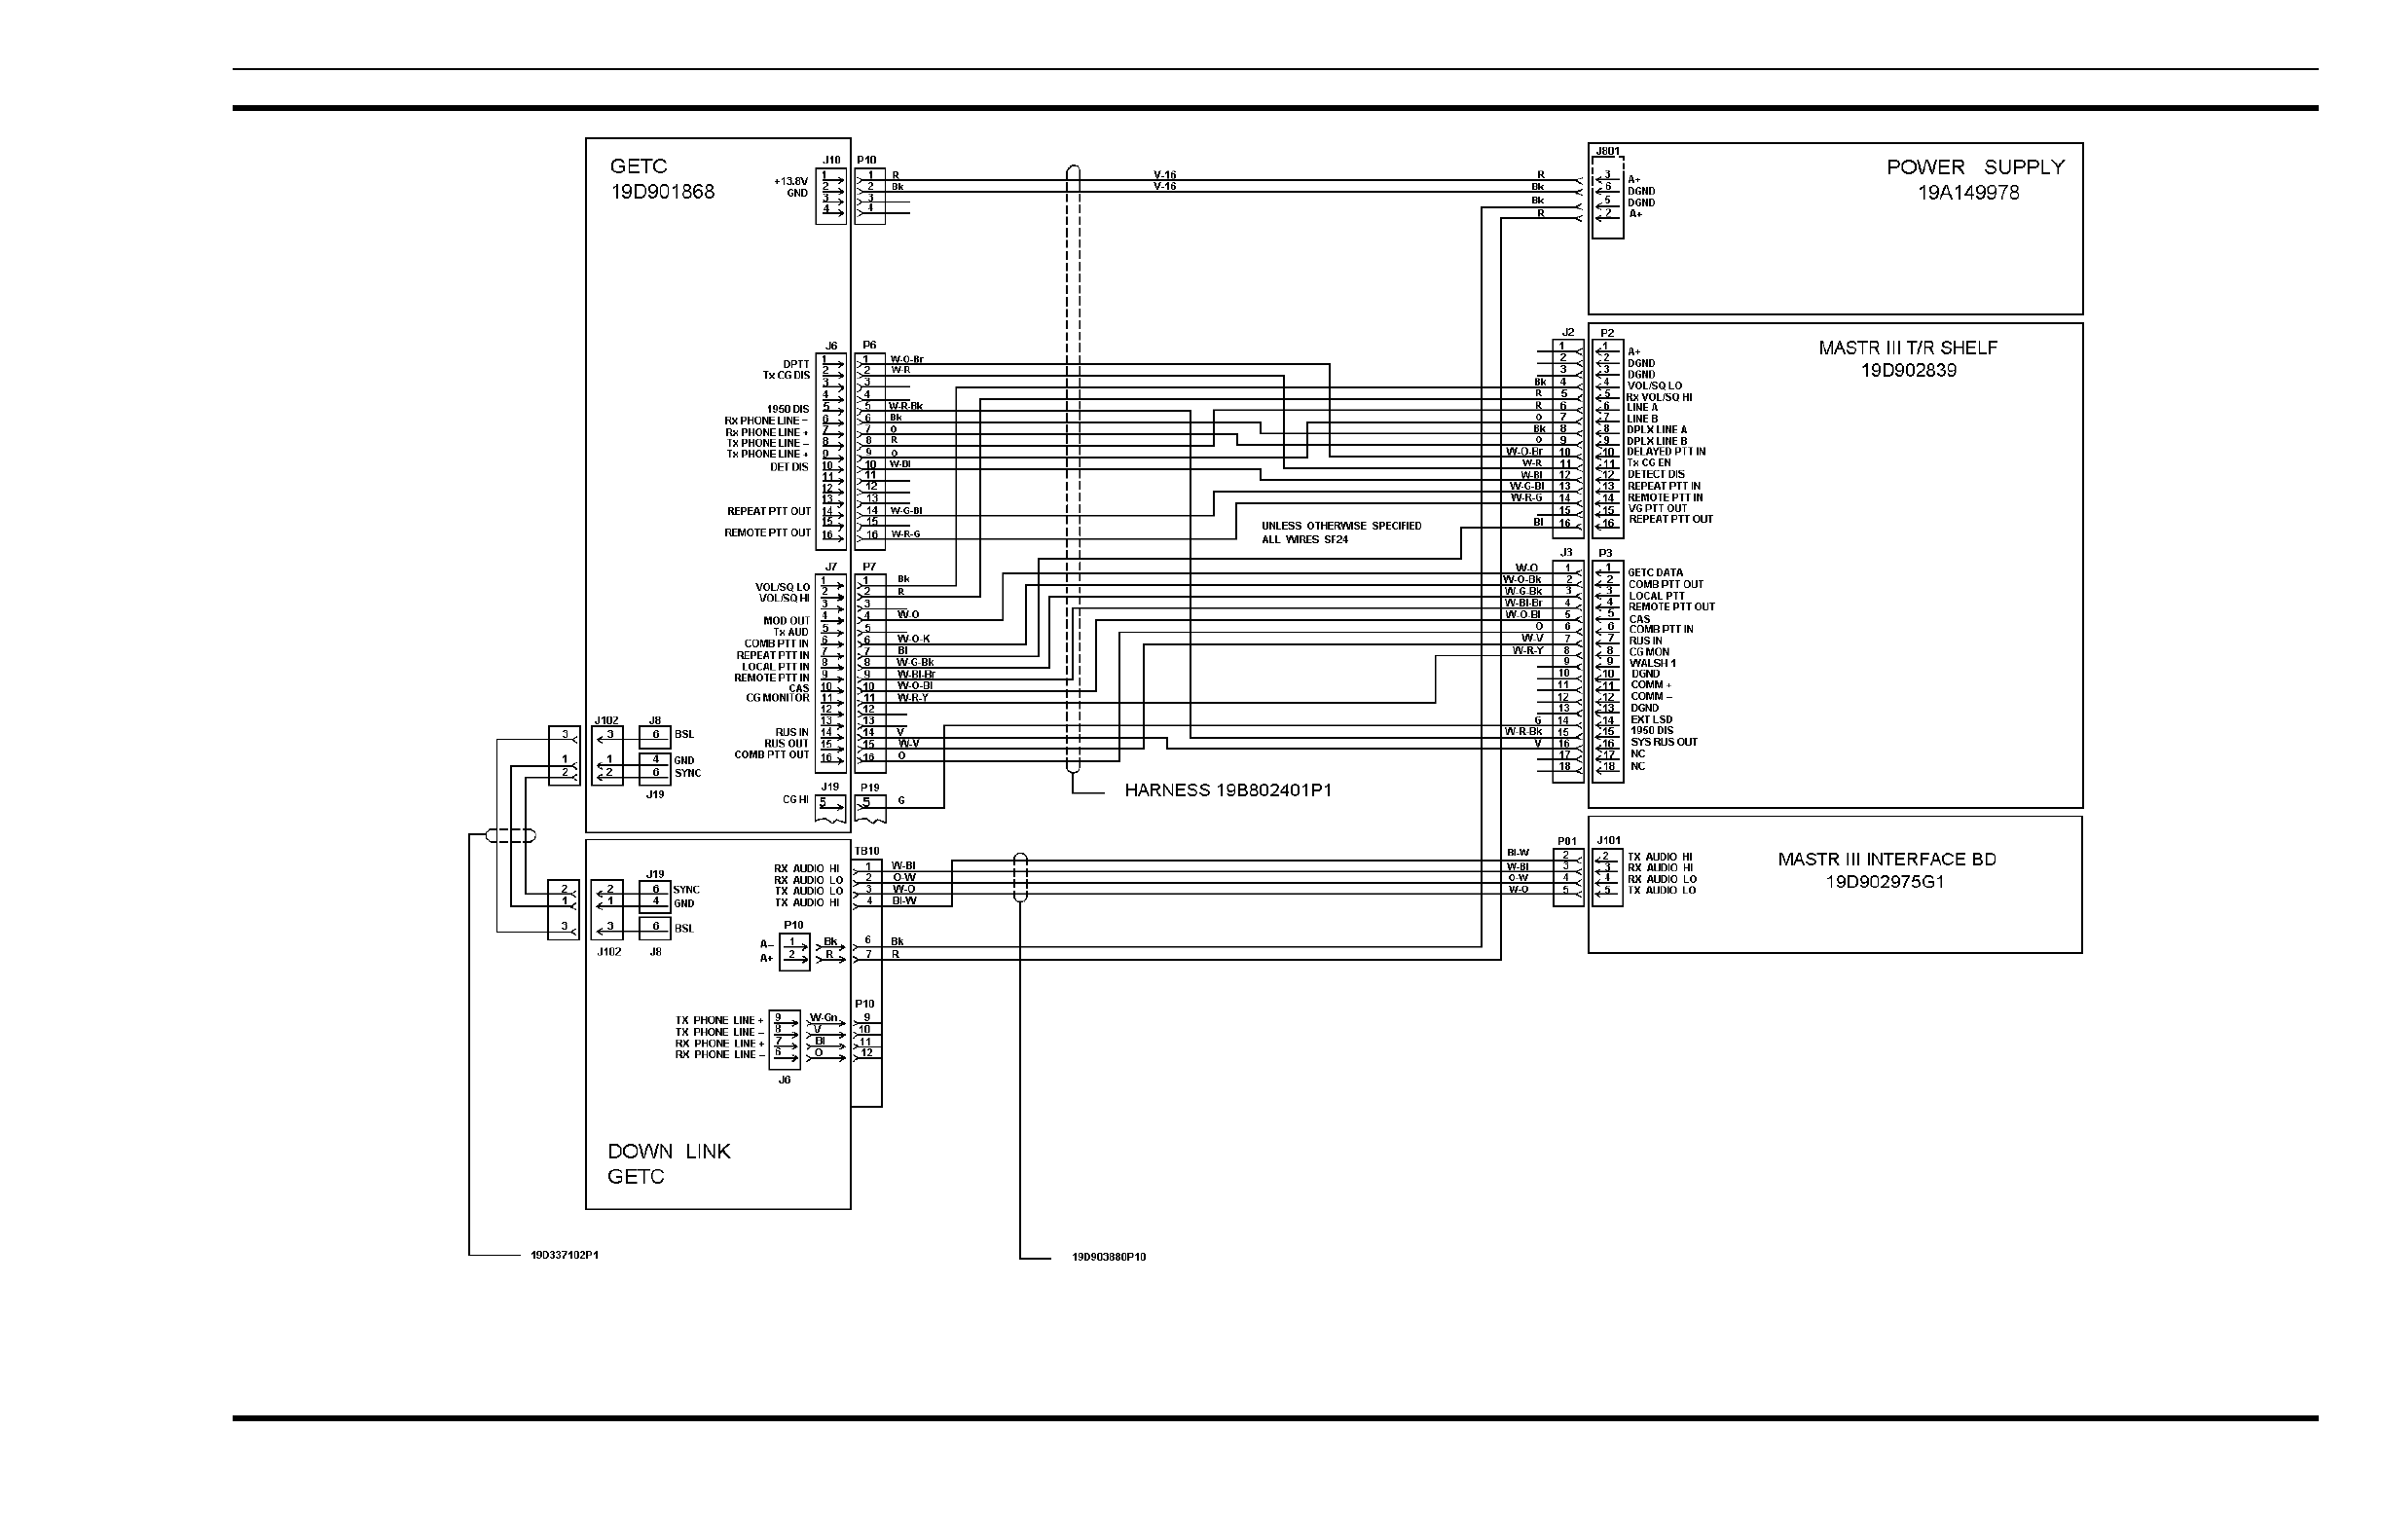 HARRIS TR-0025-E Land Mobile Base Station User Manual Part 90